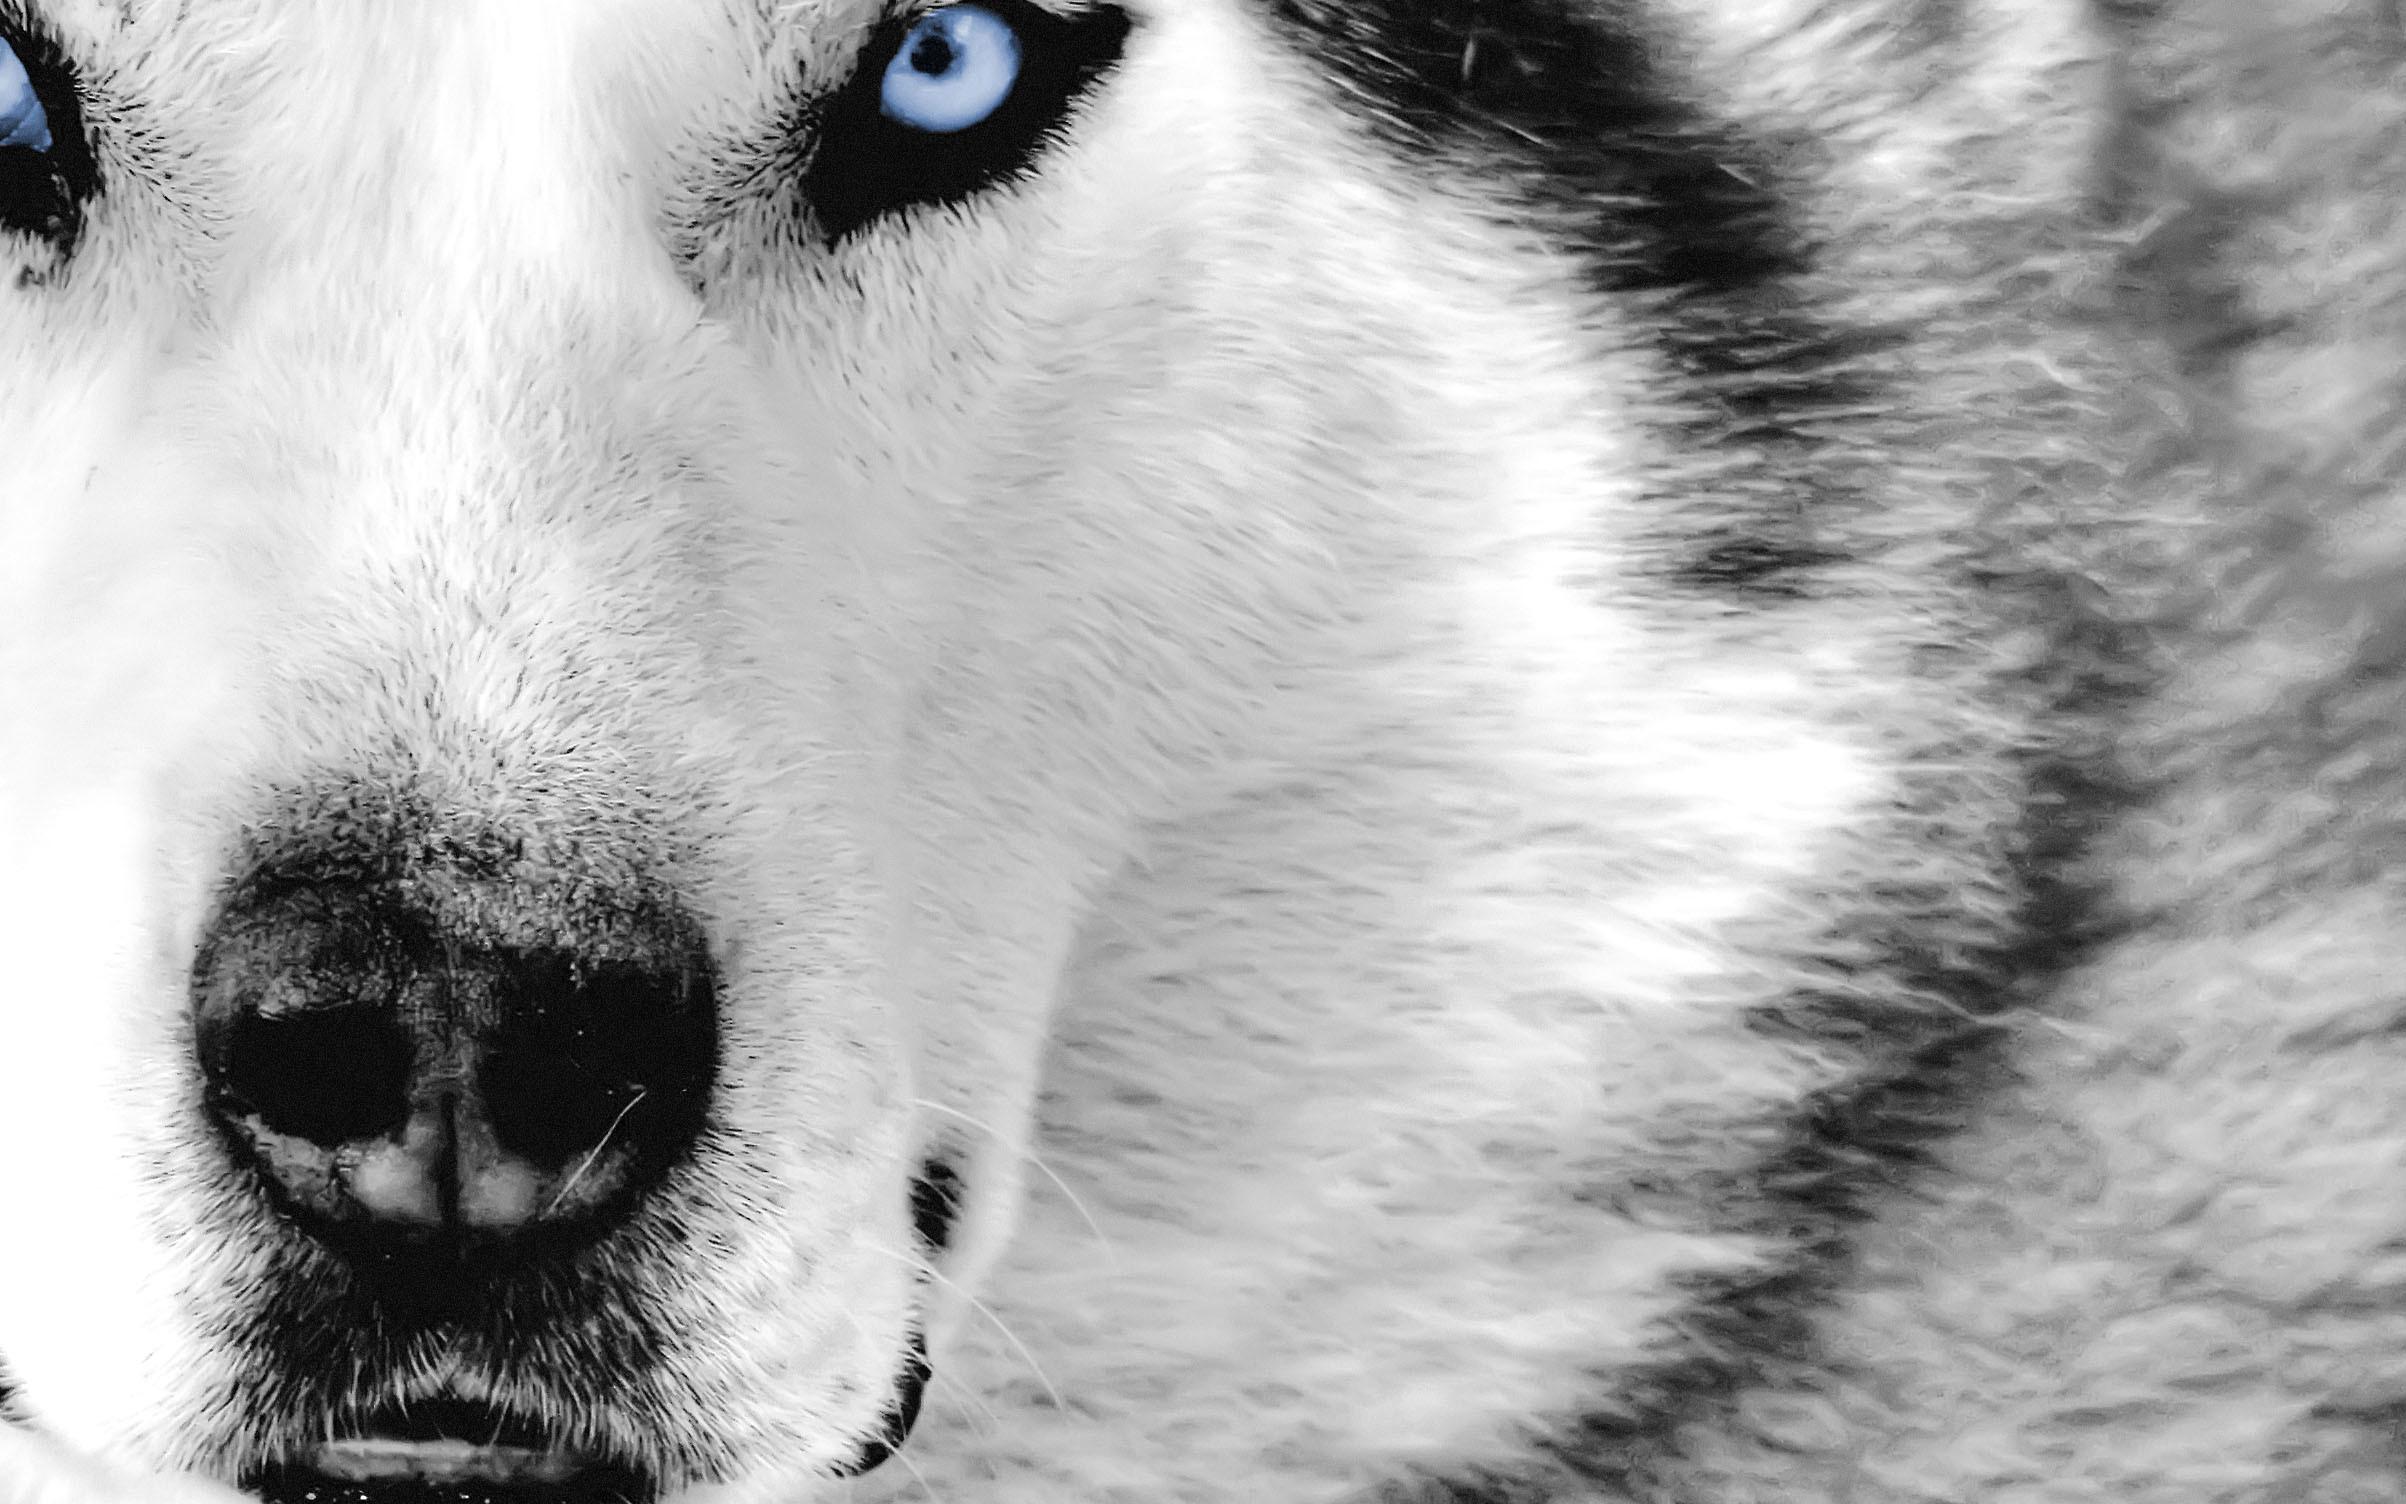 Wolf, Hd Animal Wallpapers, Pet Love, Cool Animals, Desktop Images, Wild